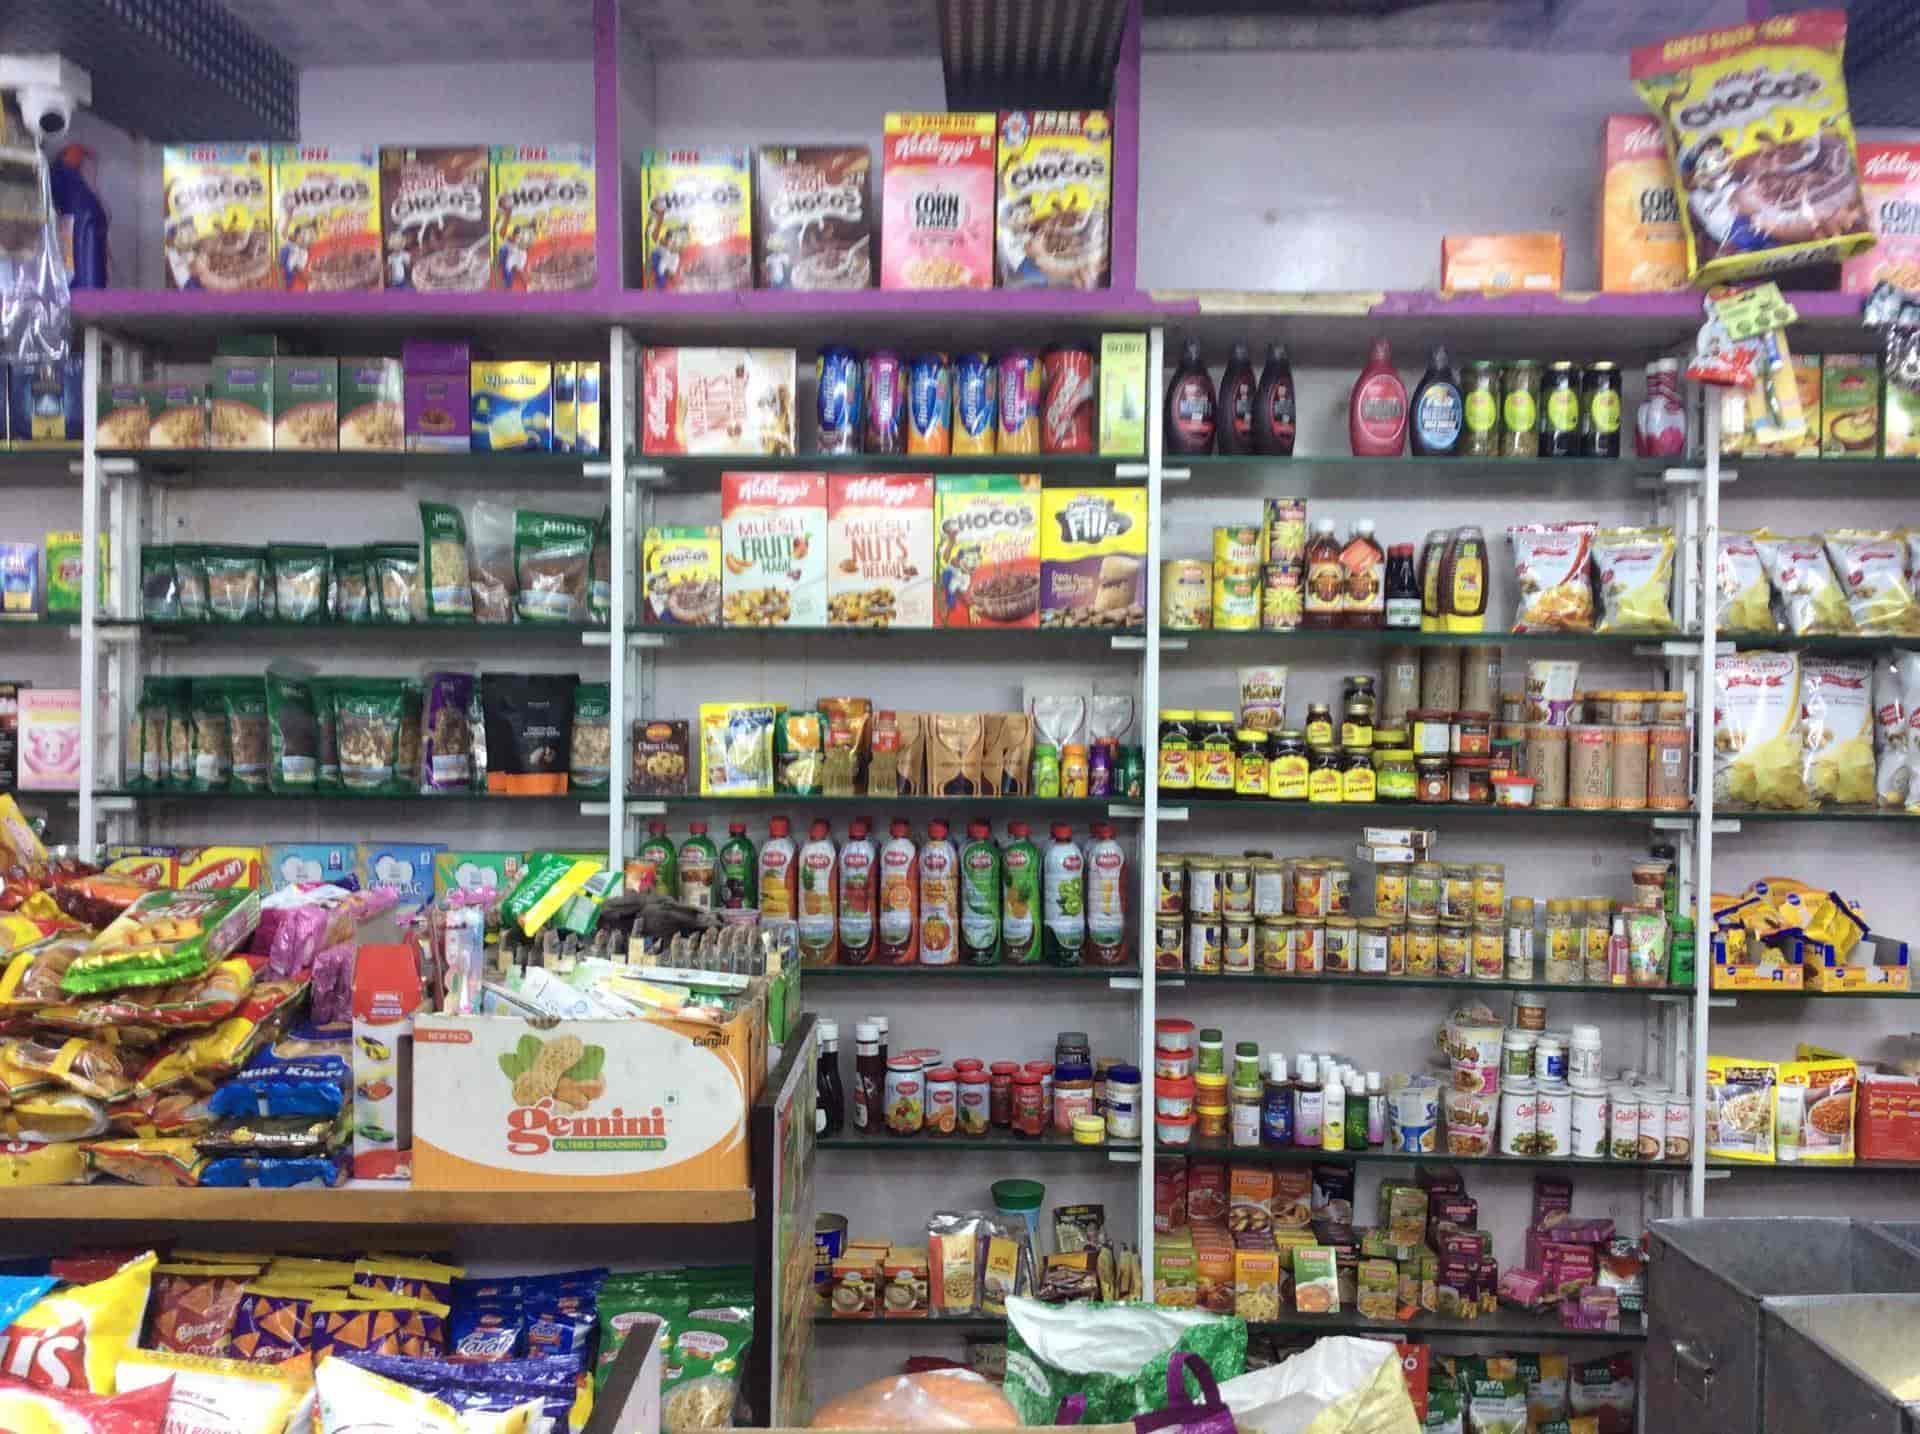 Green Mart, Vishal Nagar Pimple Nilakh - Dairy Product